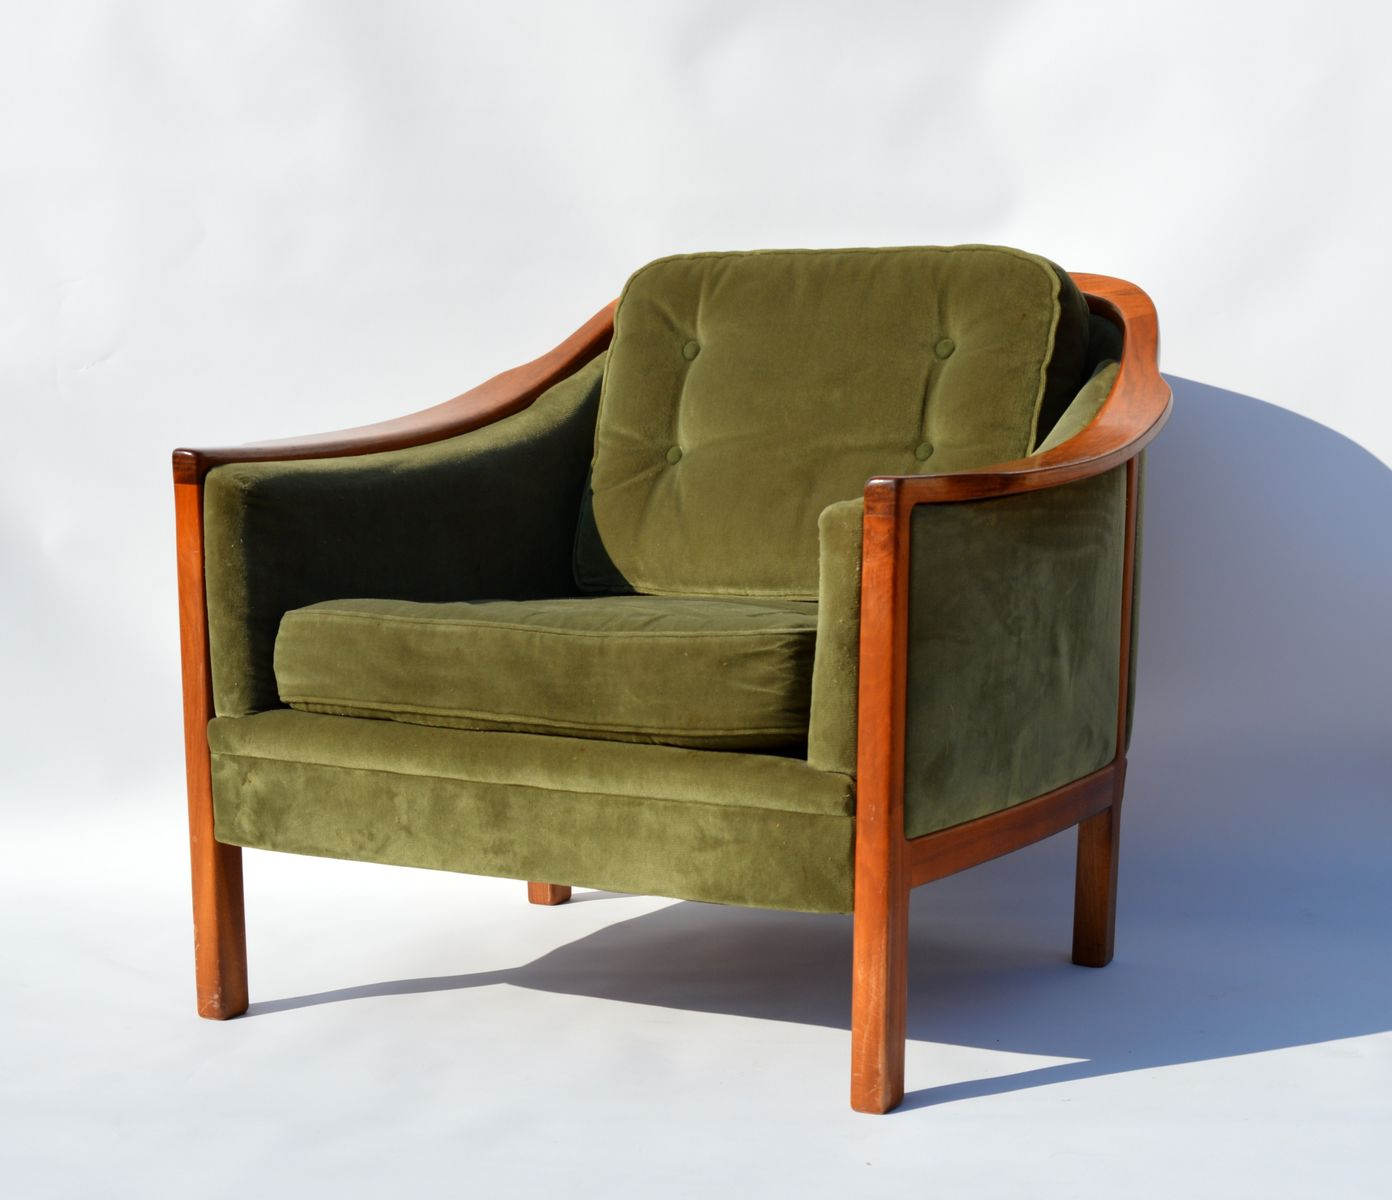 Schwedisches teak sofa sessel set 1960er bei pamono kaufen for Sofa sessel